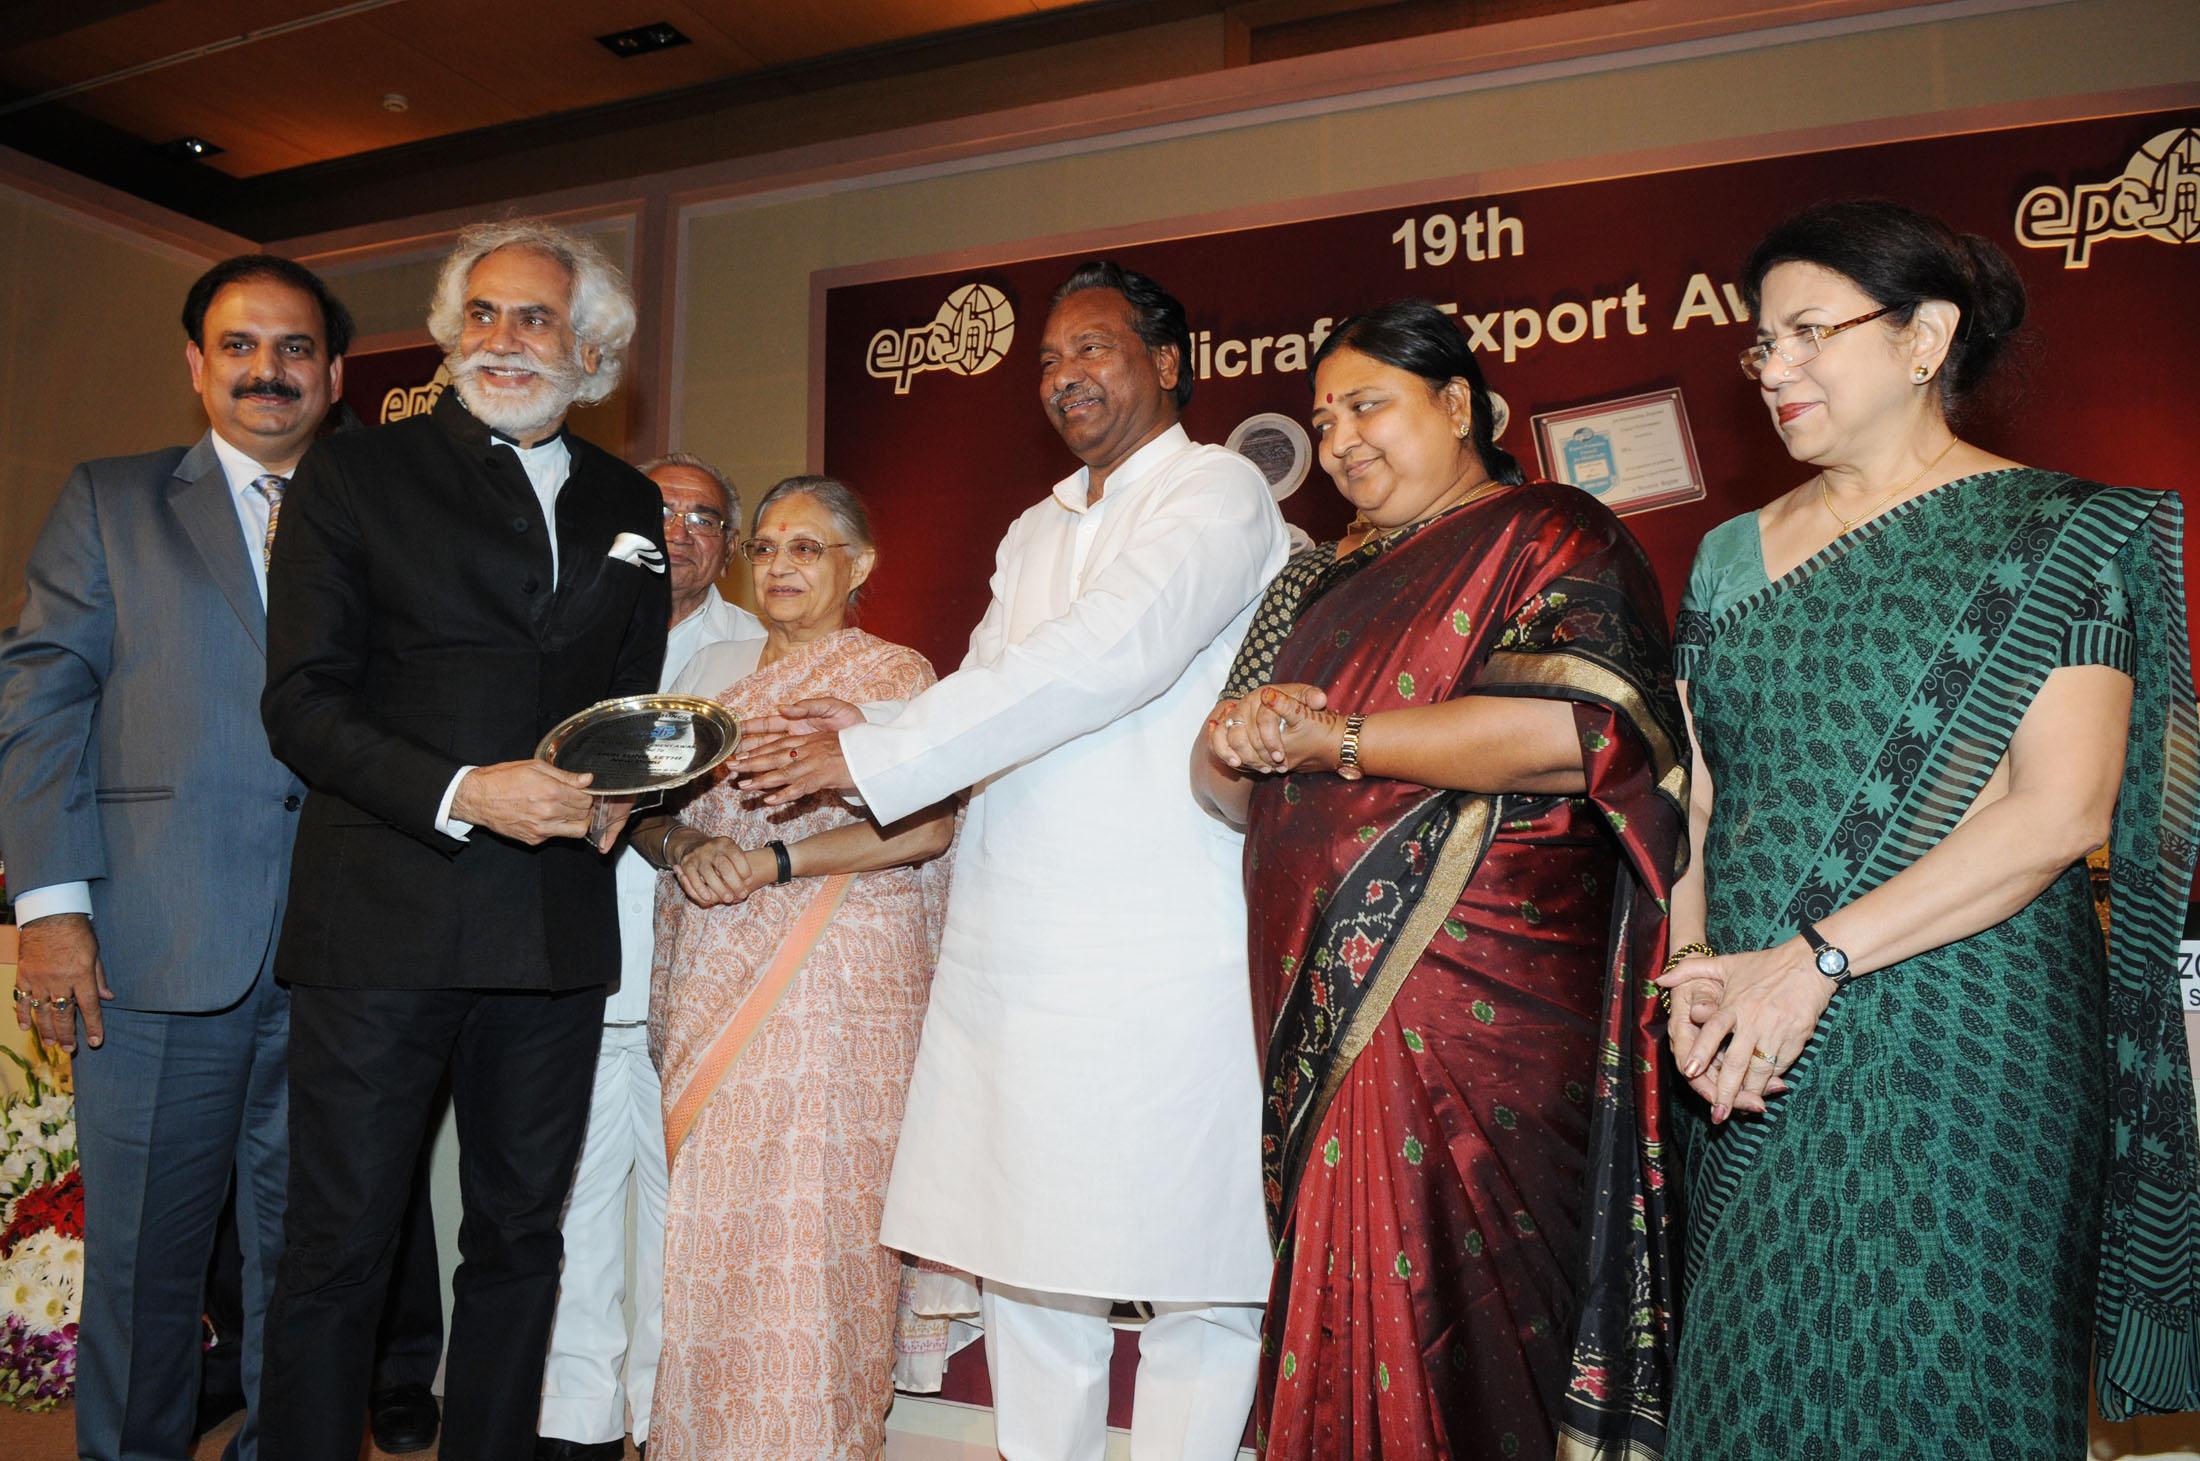 File Kavuru Sambasiva Presenting The 19th Handicrafts Export Award